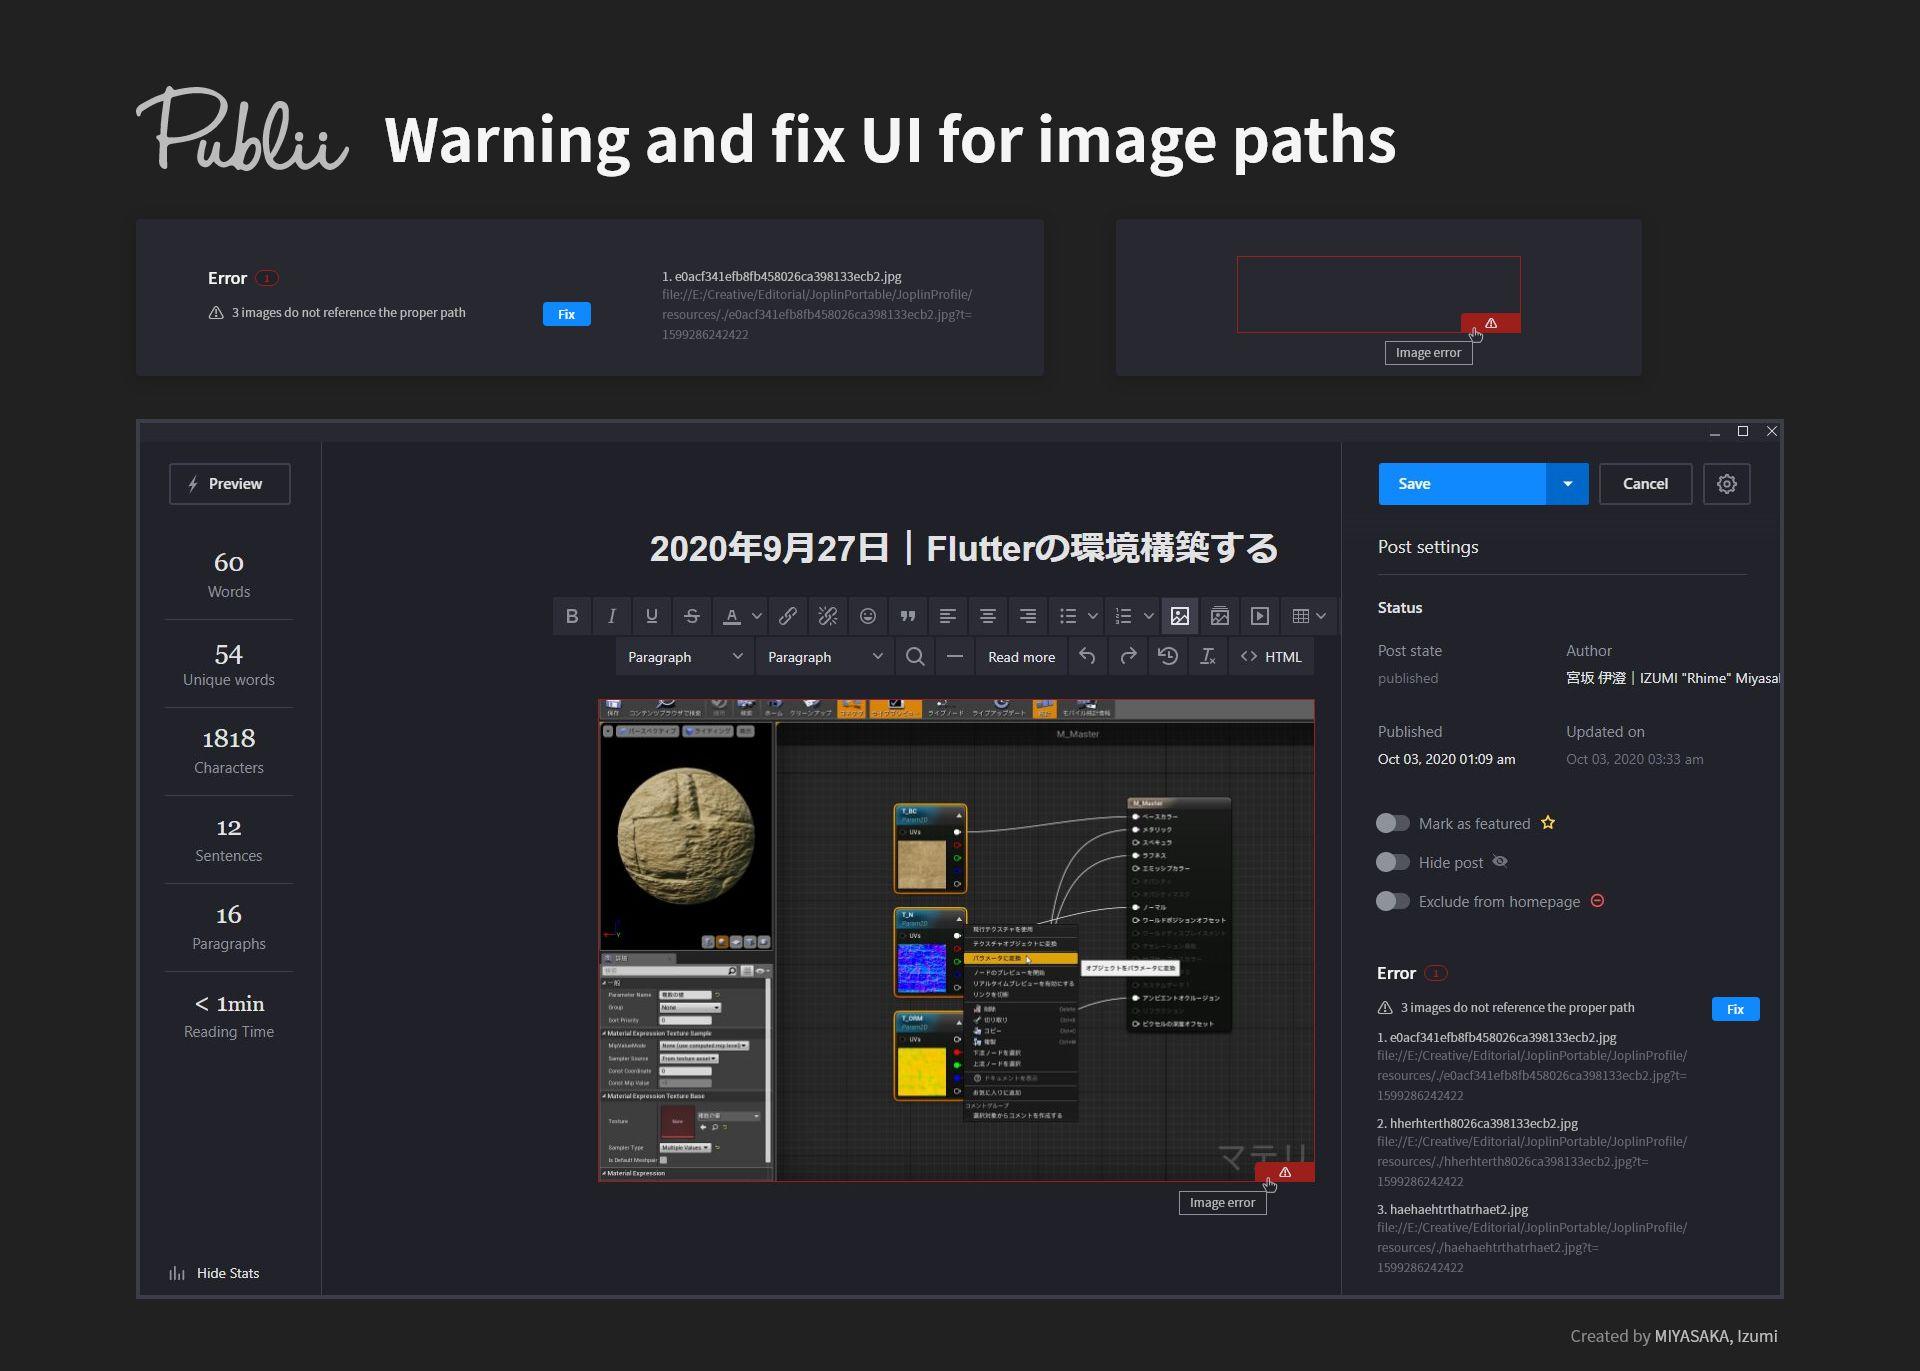 Publii_Image-path-warning-UI_002_003_compressed